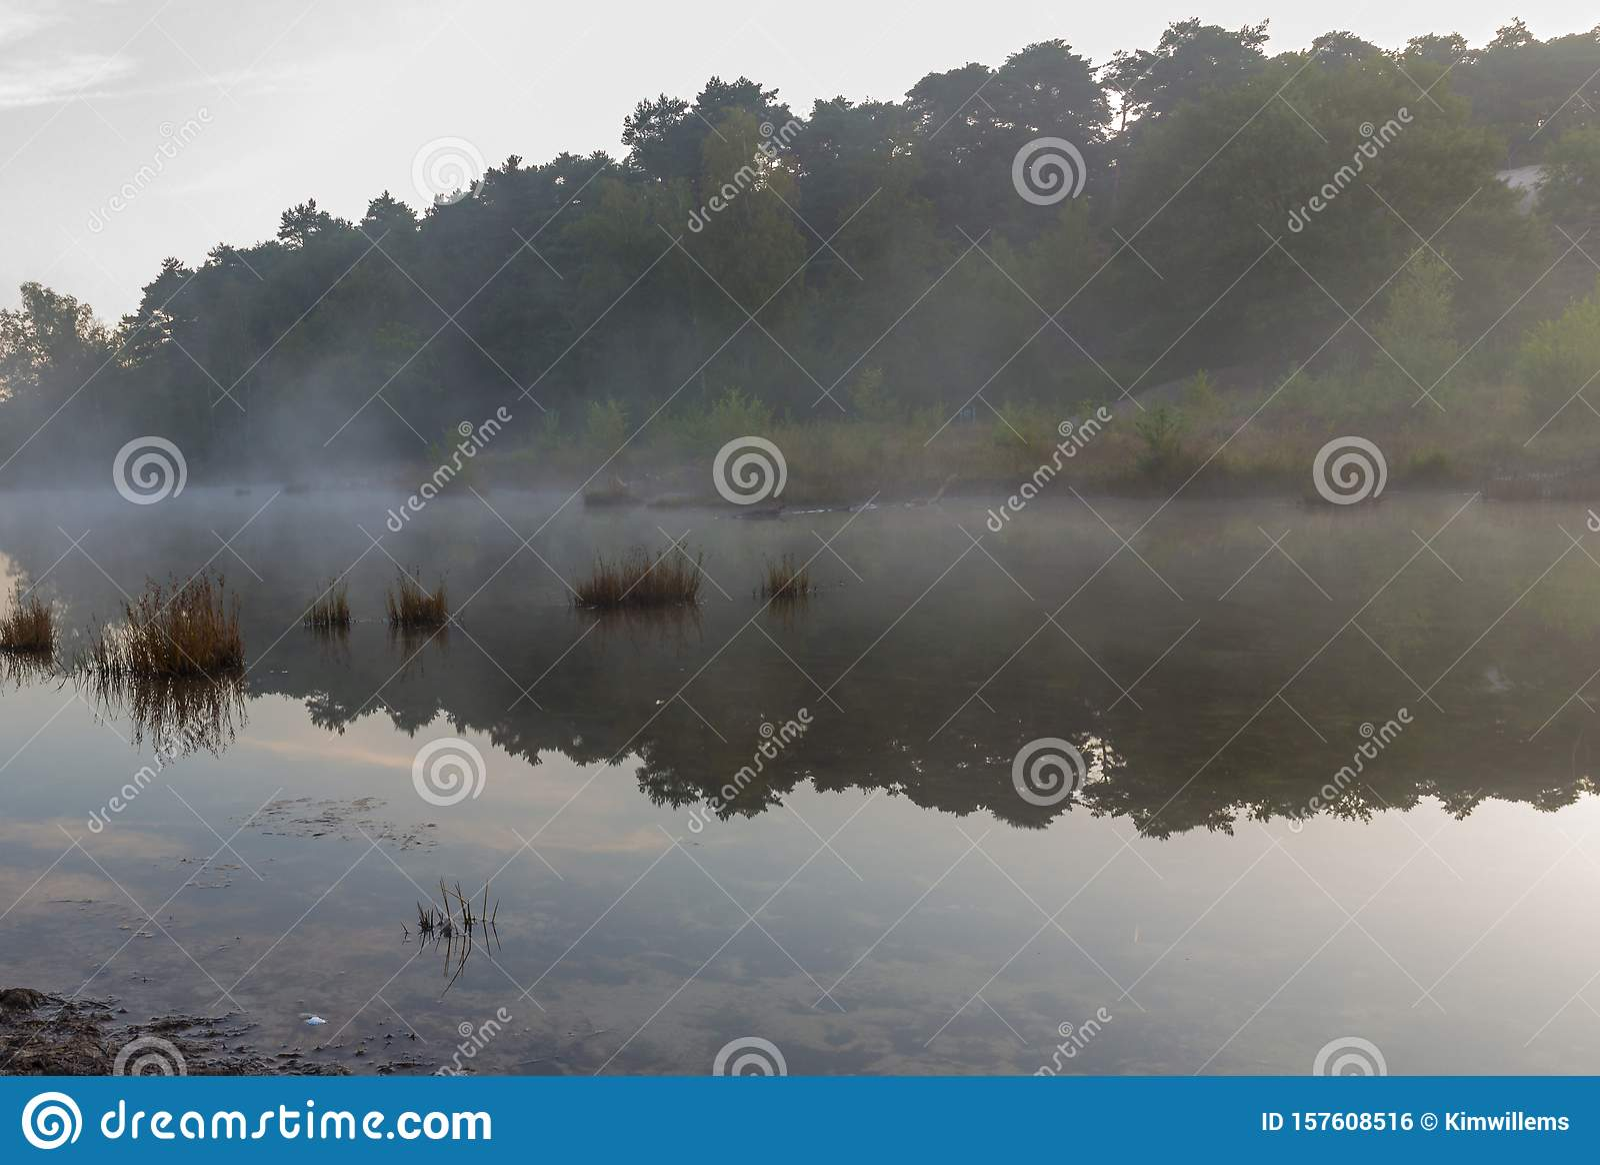 Brunsummerheide a national park in South Limburg ith morning fog over the swamp during sunrise